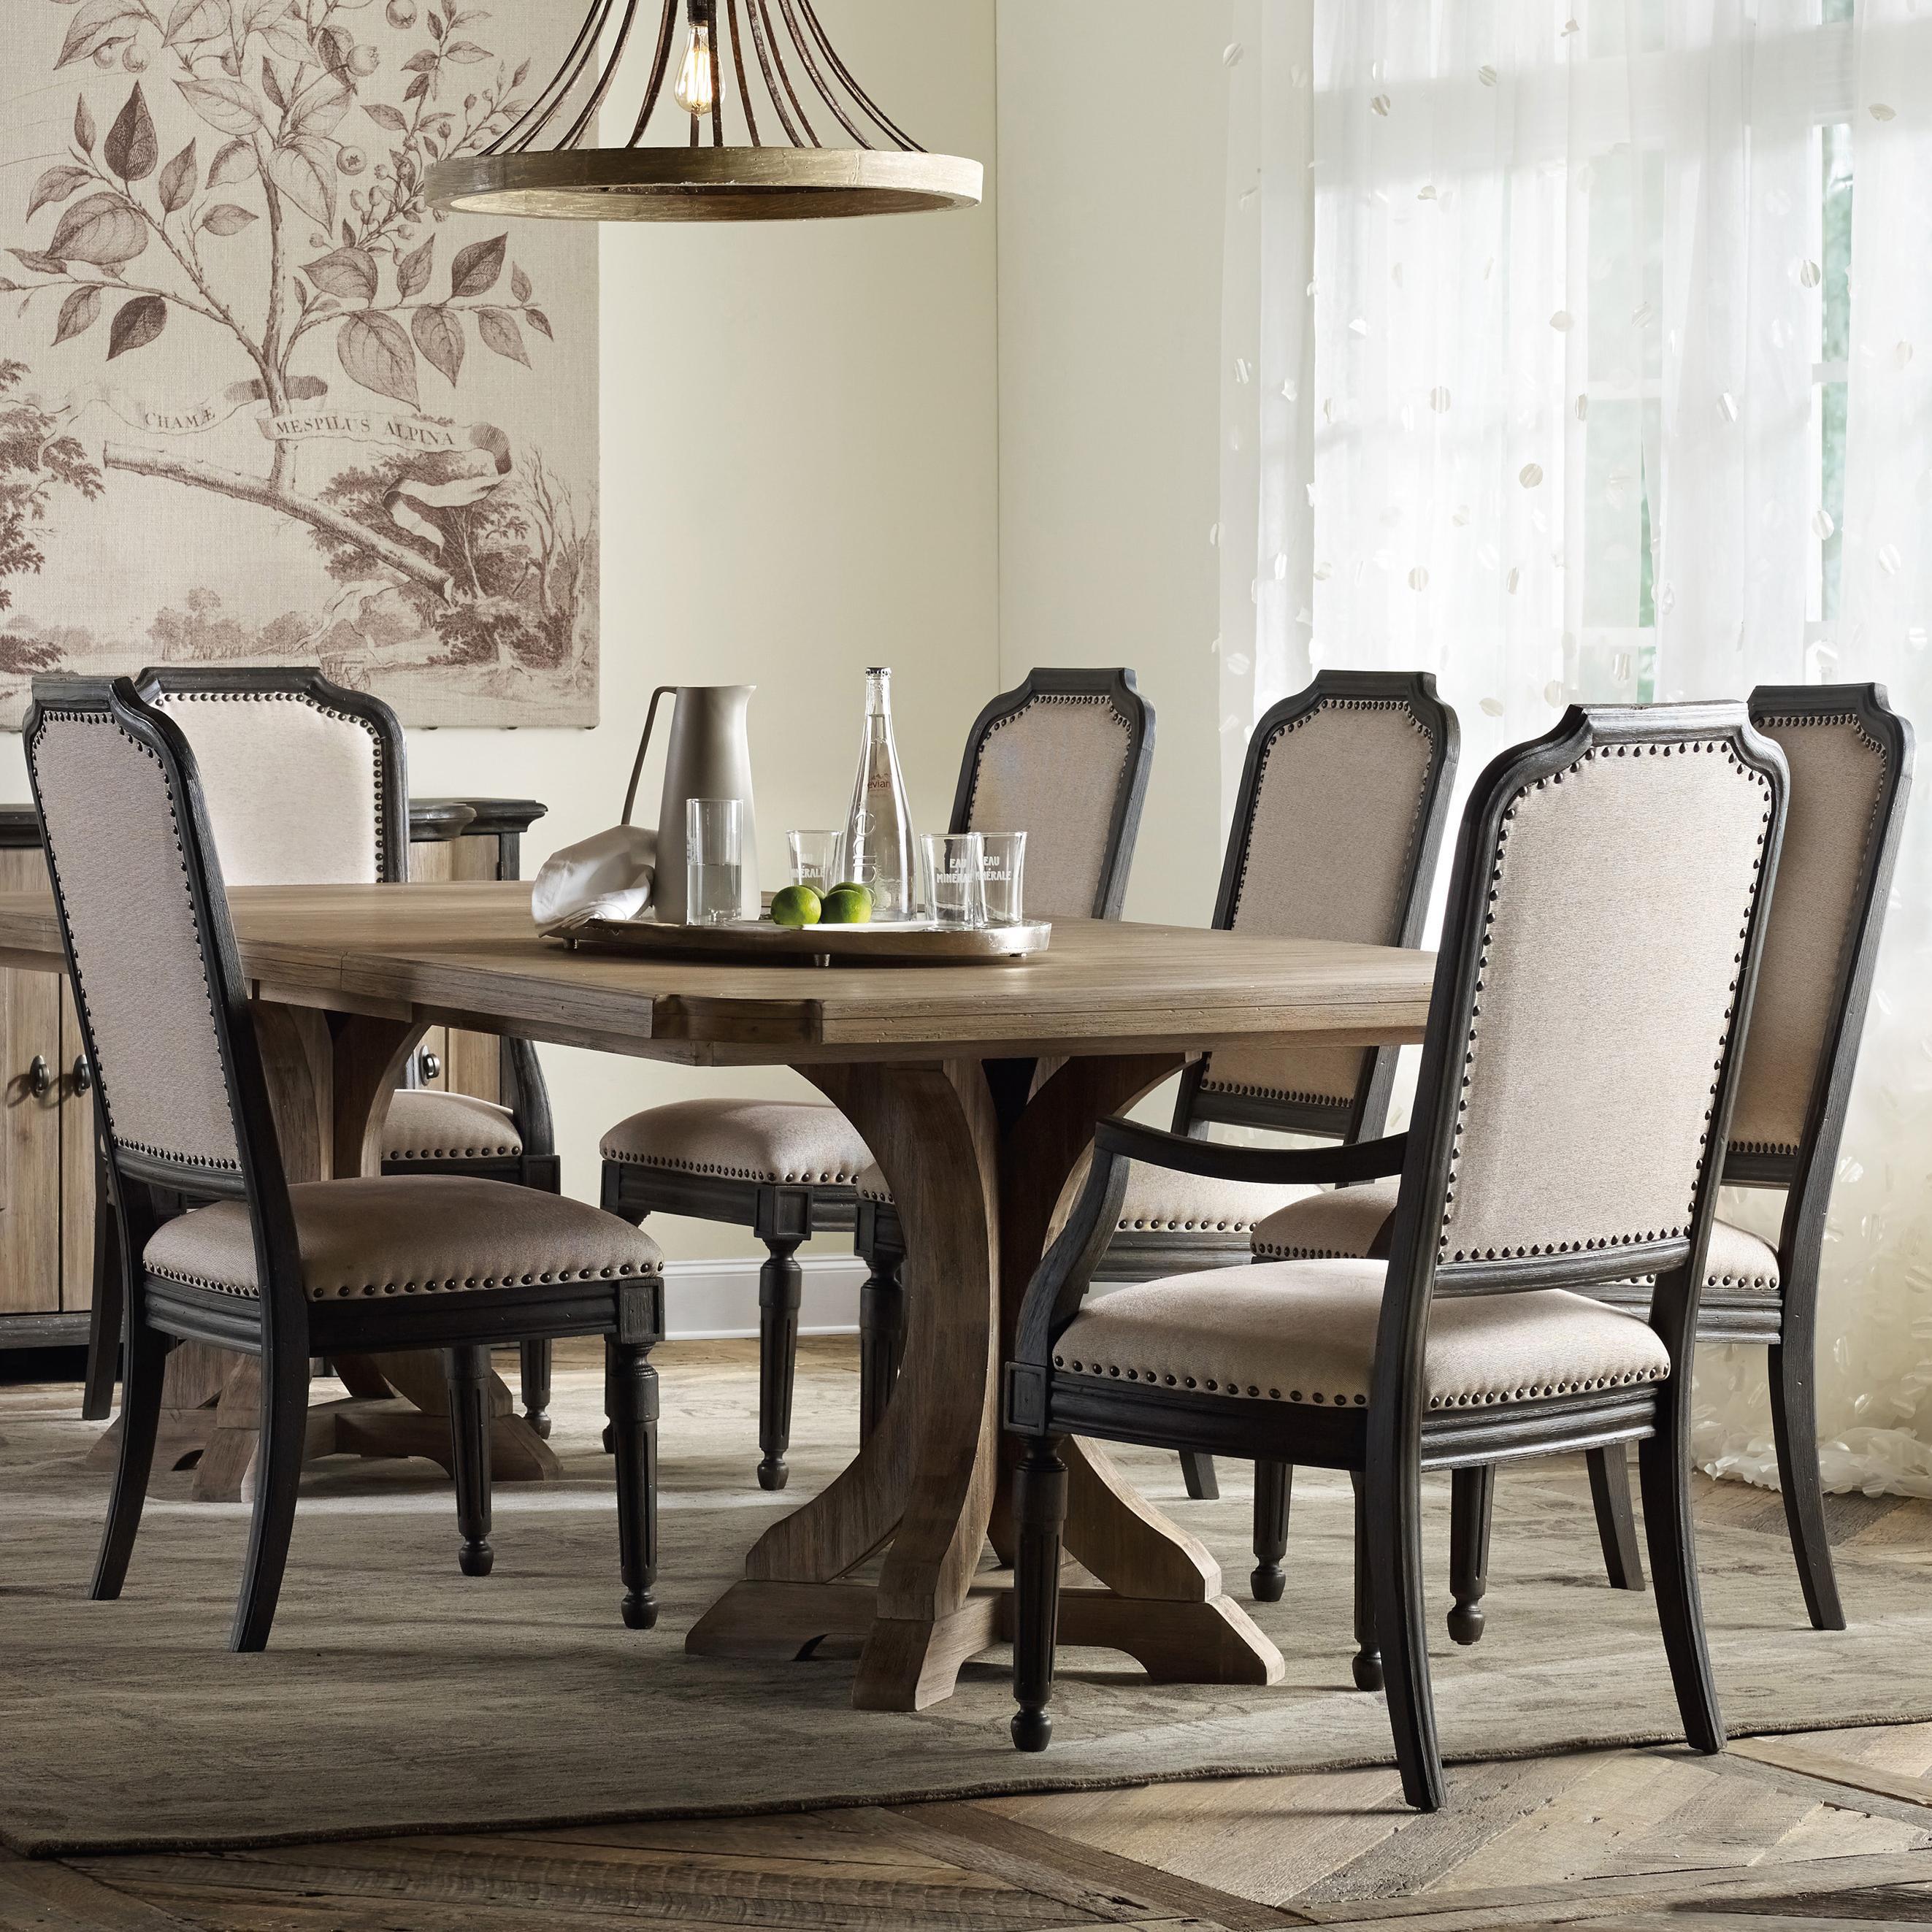 hooker furniture corsica rectangle pedestal dining table set with upholstered chairs olinde 39 s. Black Bedroom Furniture Sets. Home Design Ideas